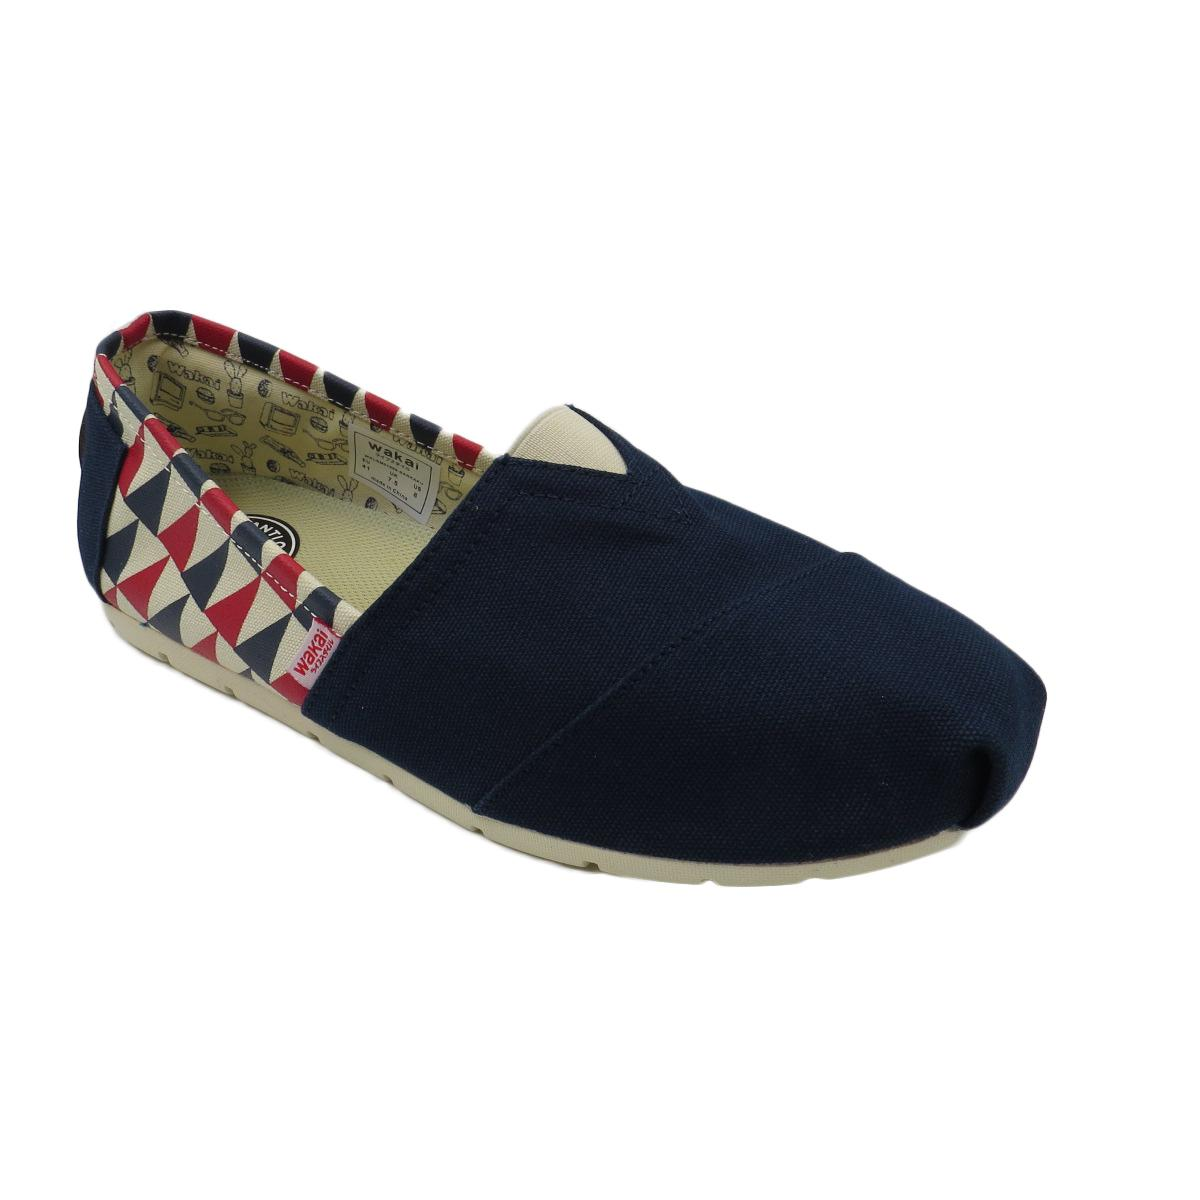 Price Wakai Sankaku Men S Slip On Shoes Navy Blue Wakai Original